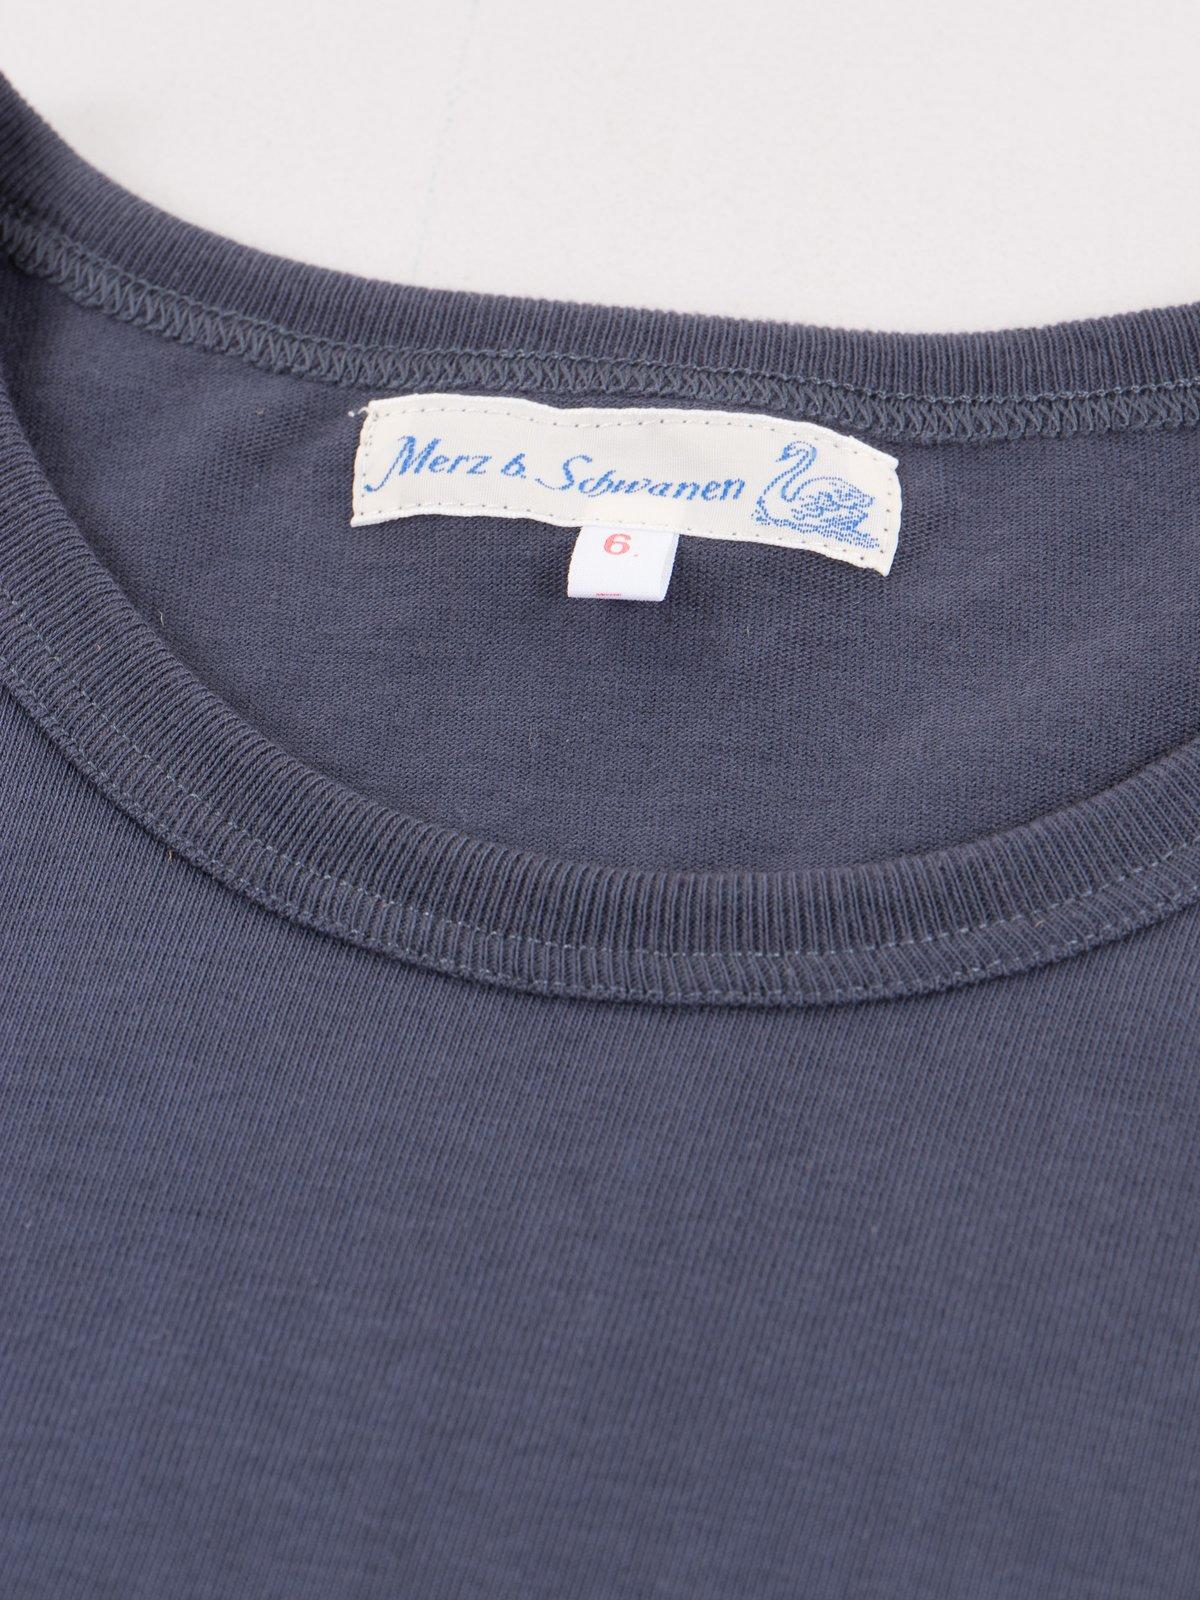 Navy 215 Organic Cotton Army Shirt - Image 4